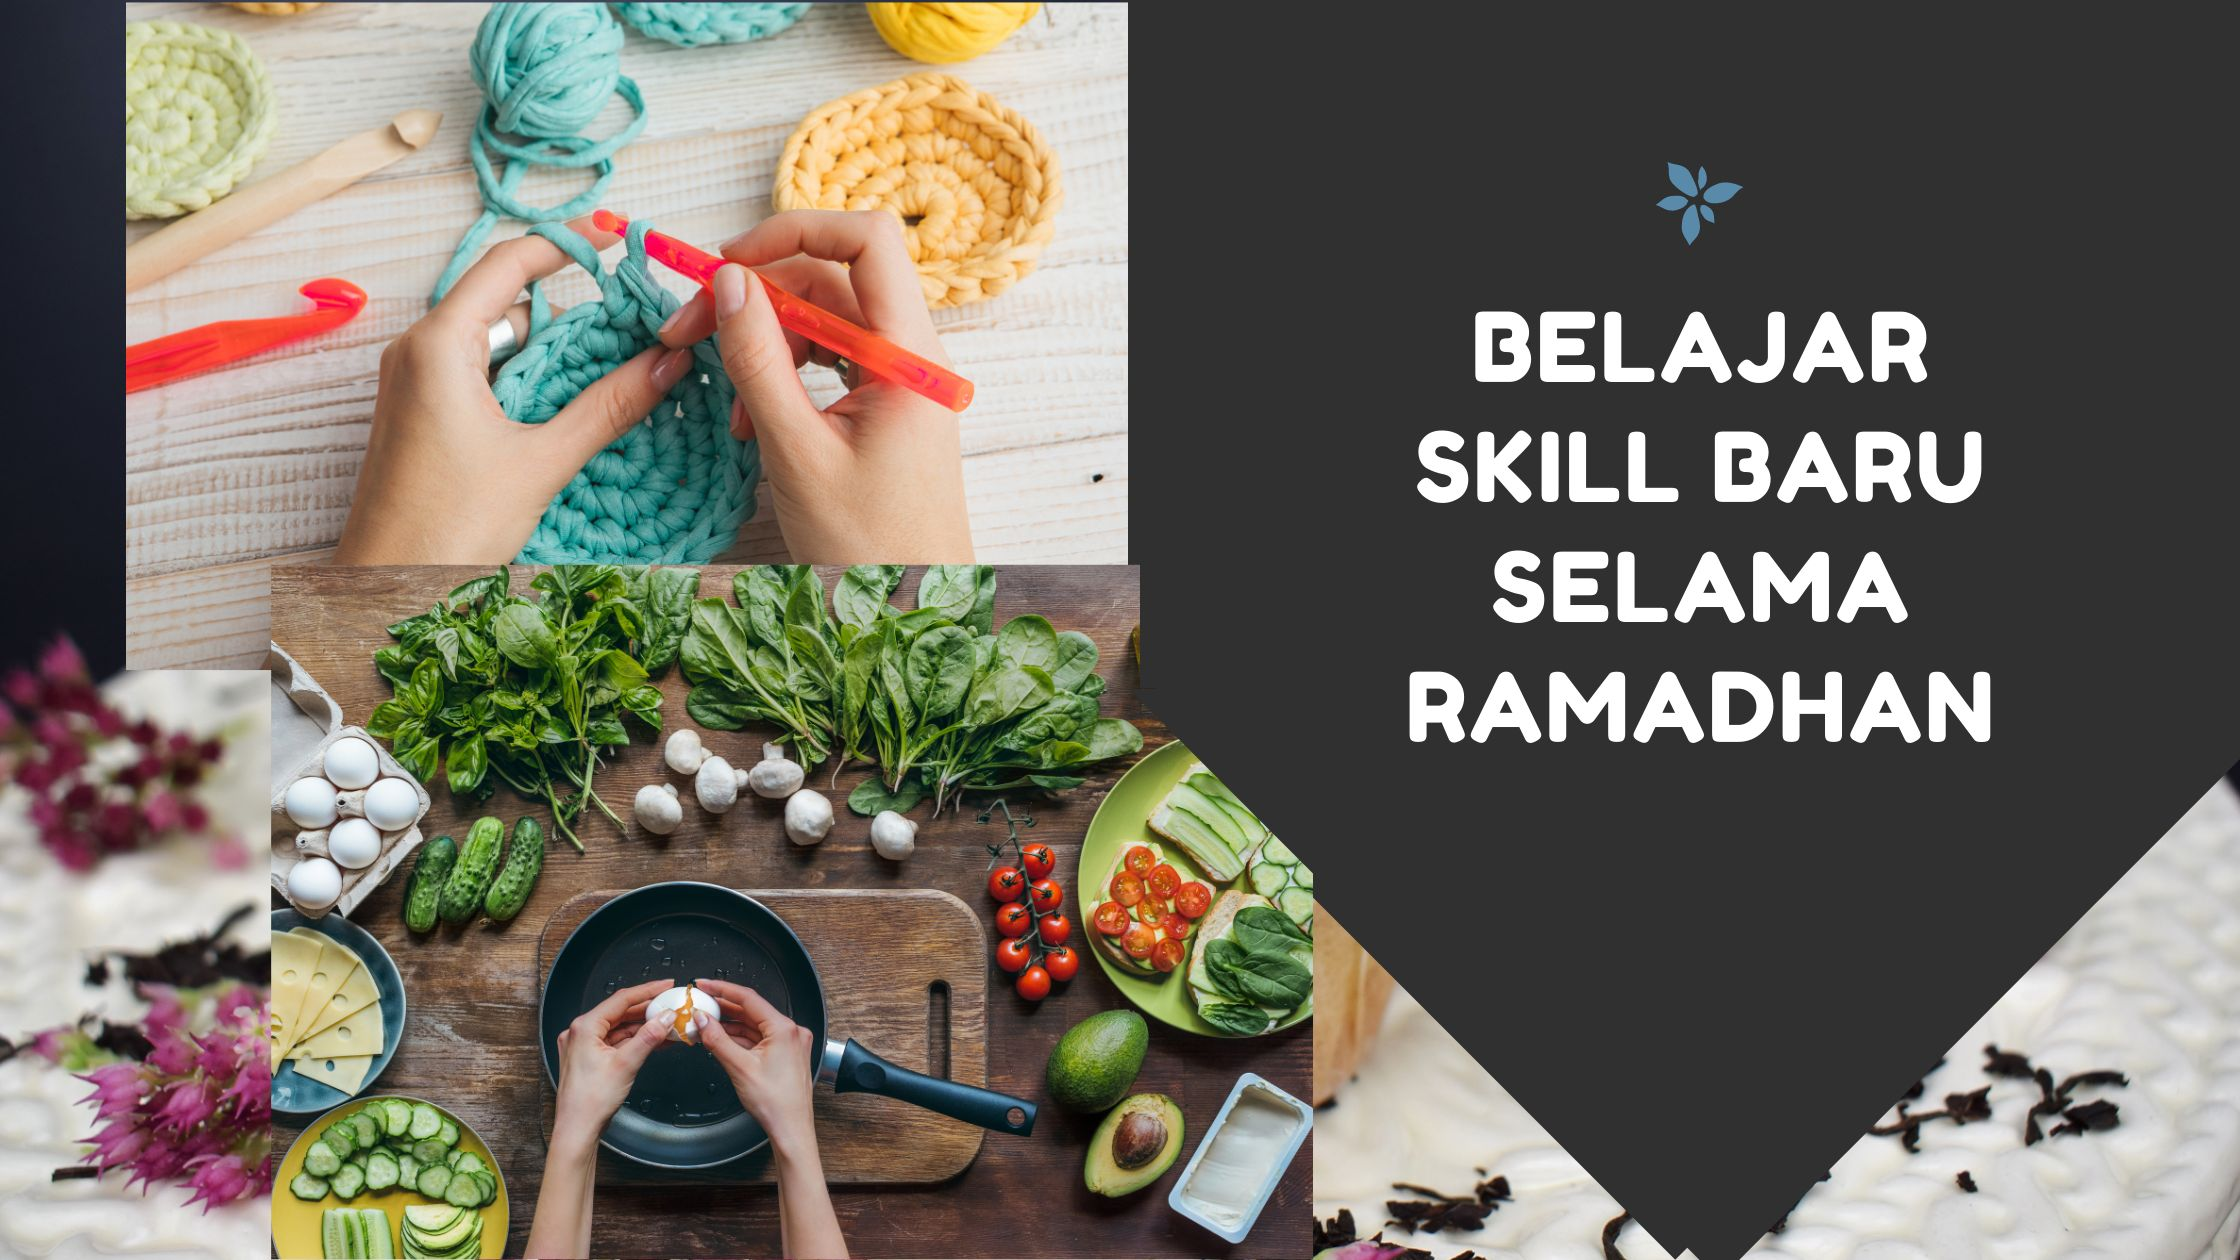 Belajar Skill Baru Selama Ramadhan